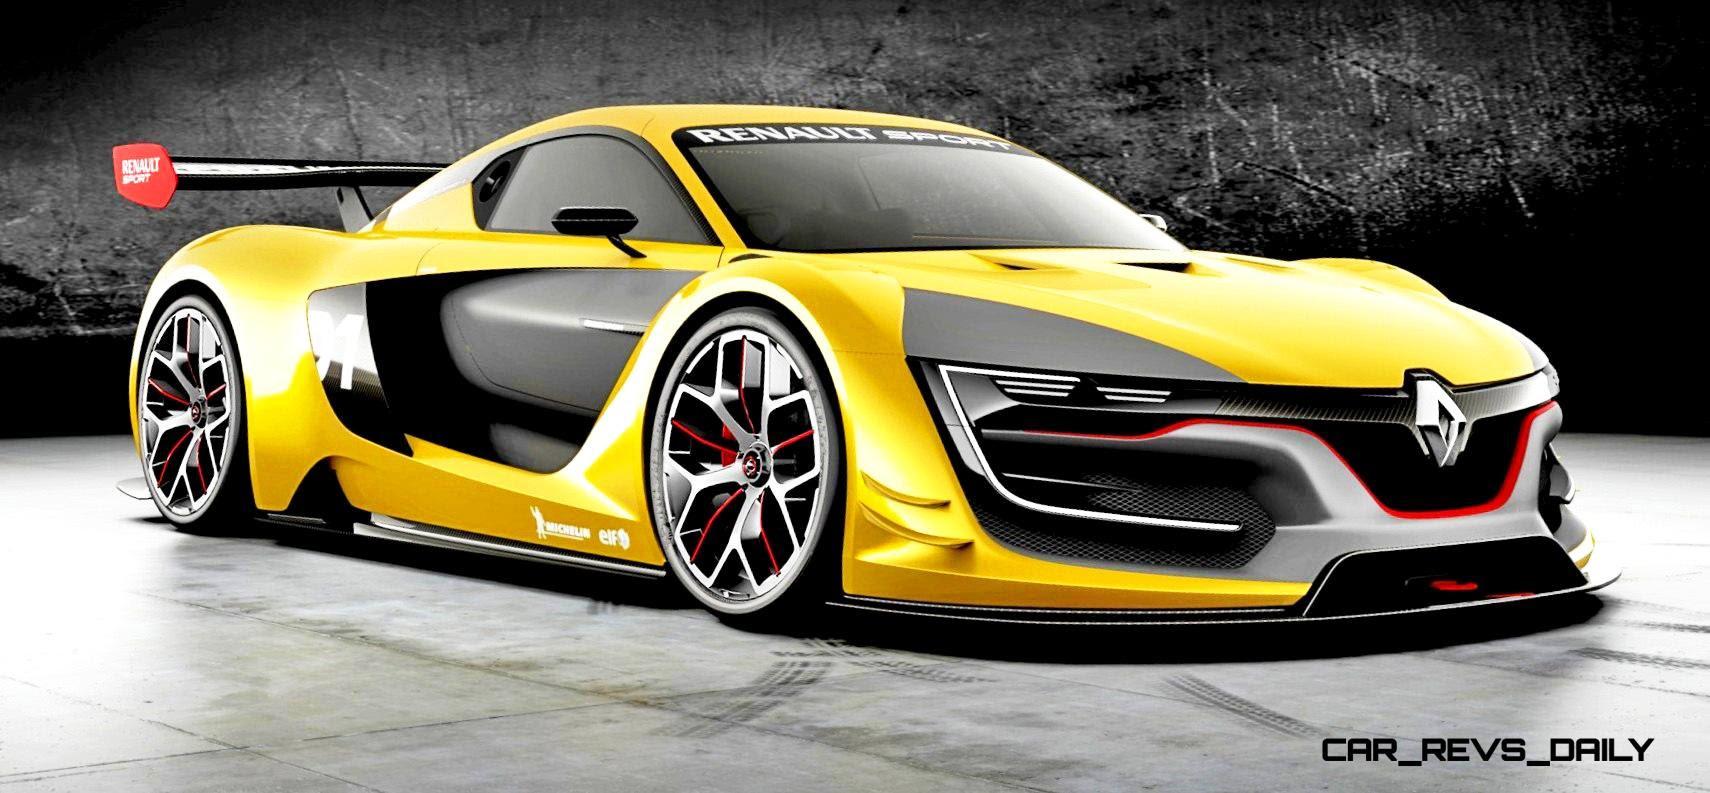 RenaultSport R.S. 01 Racecar Runs GT-R Engine In Mid-Ship ...